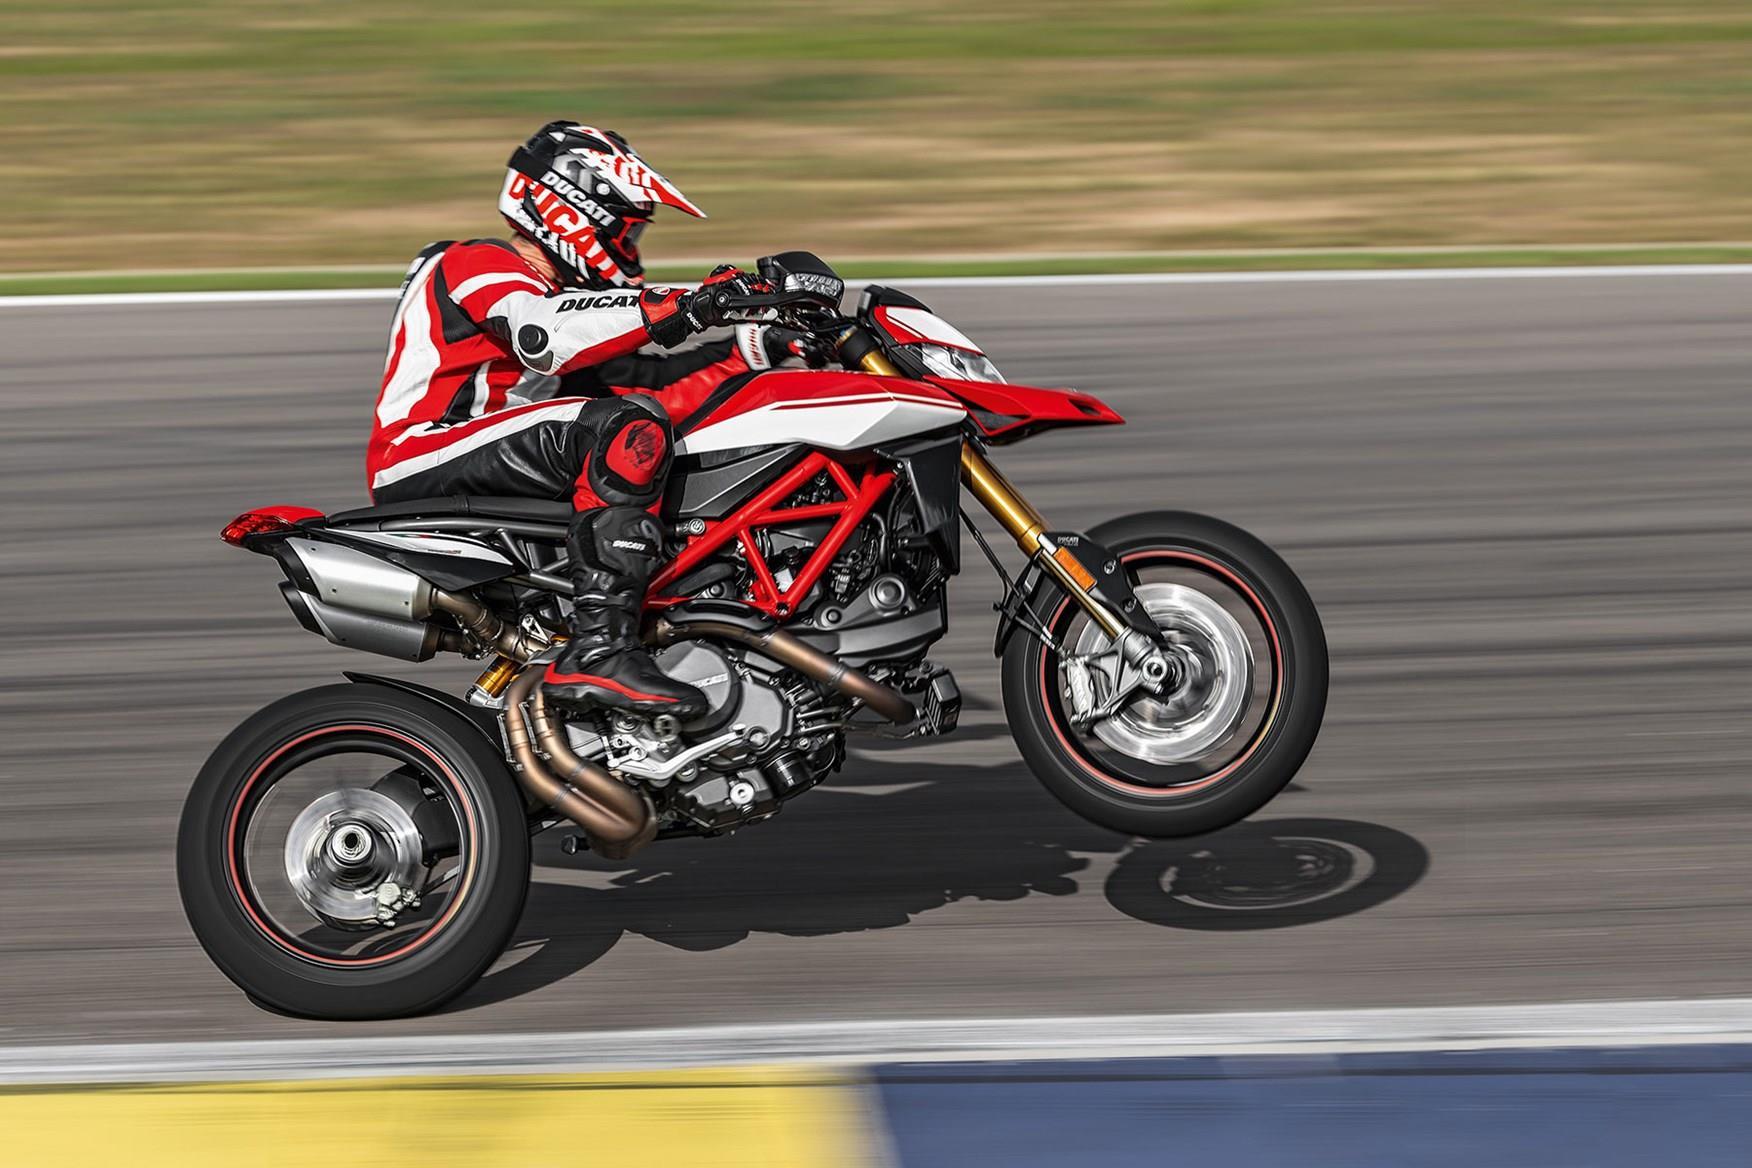 A Ducati Hypermotard 950 wheelie